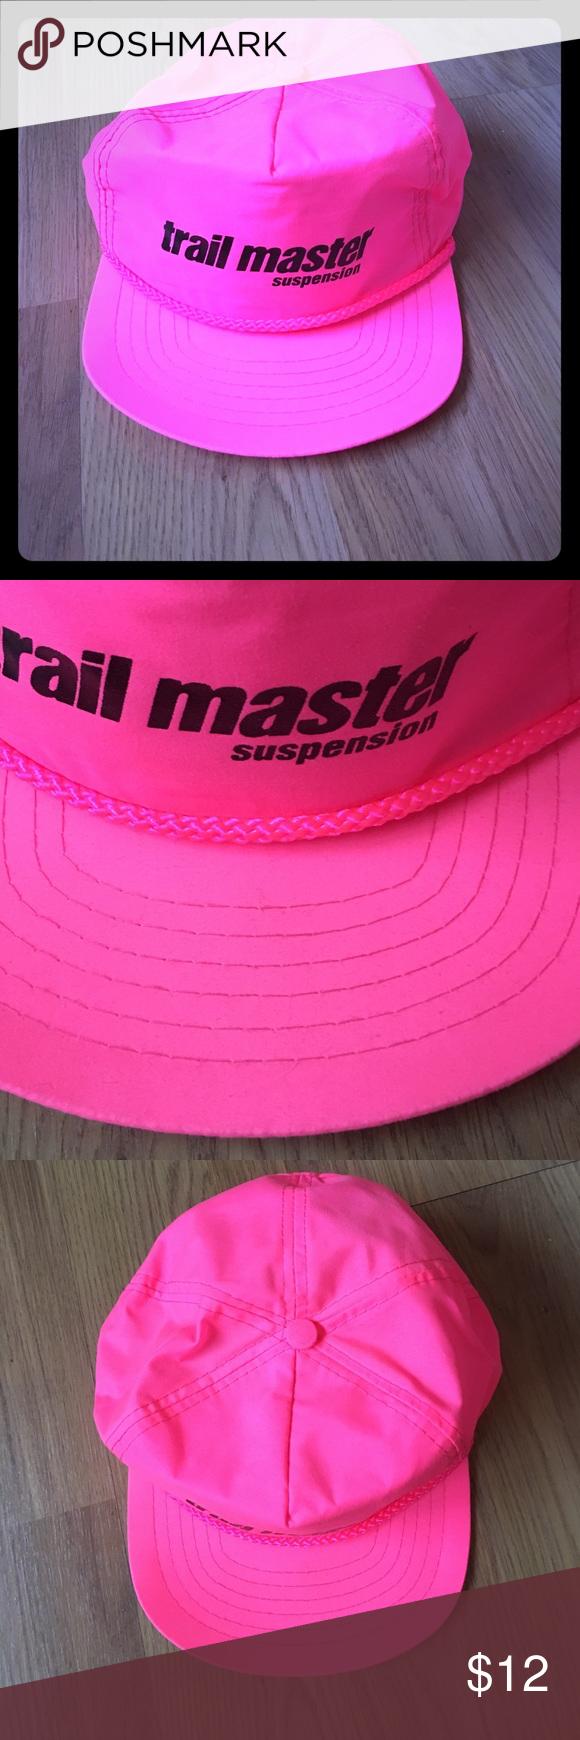 Vintage Trail Master Suspension Neon Pink Hat Pink Hat Neon Pink Pink Ladies